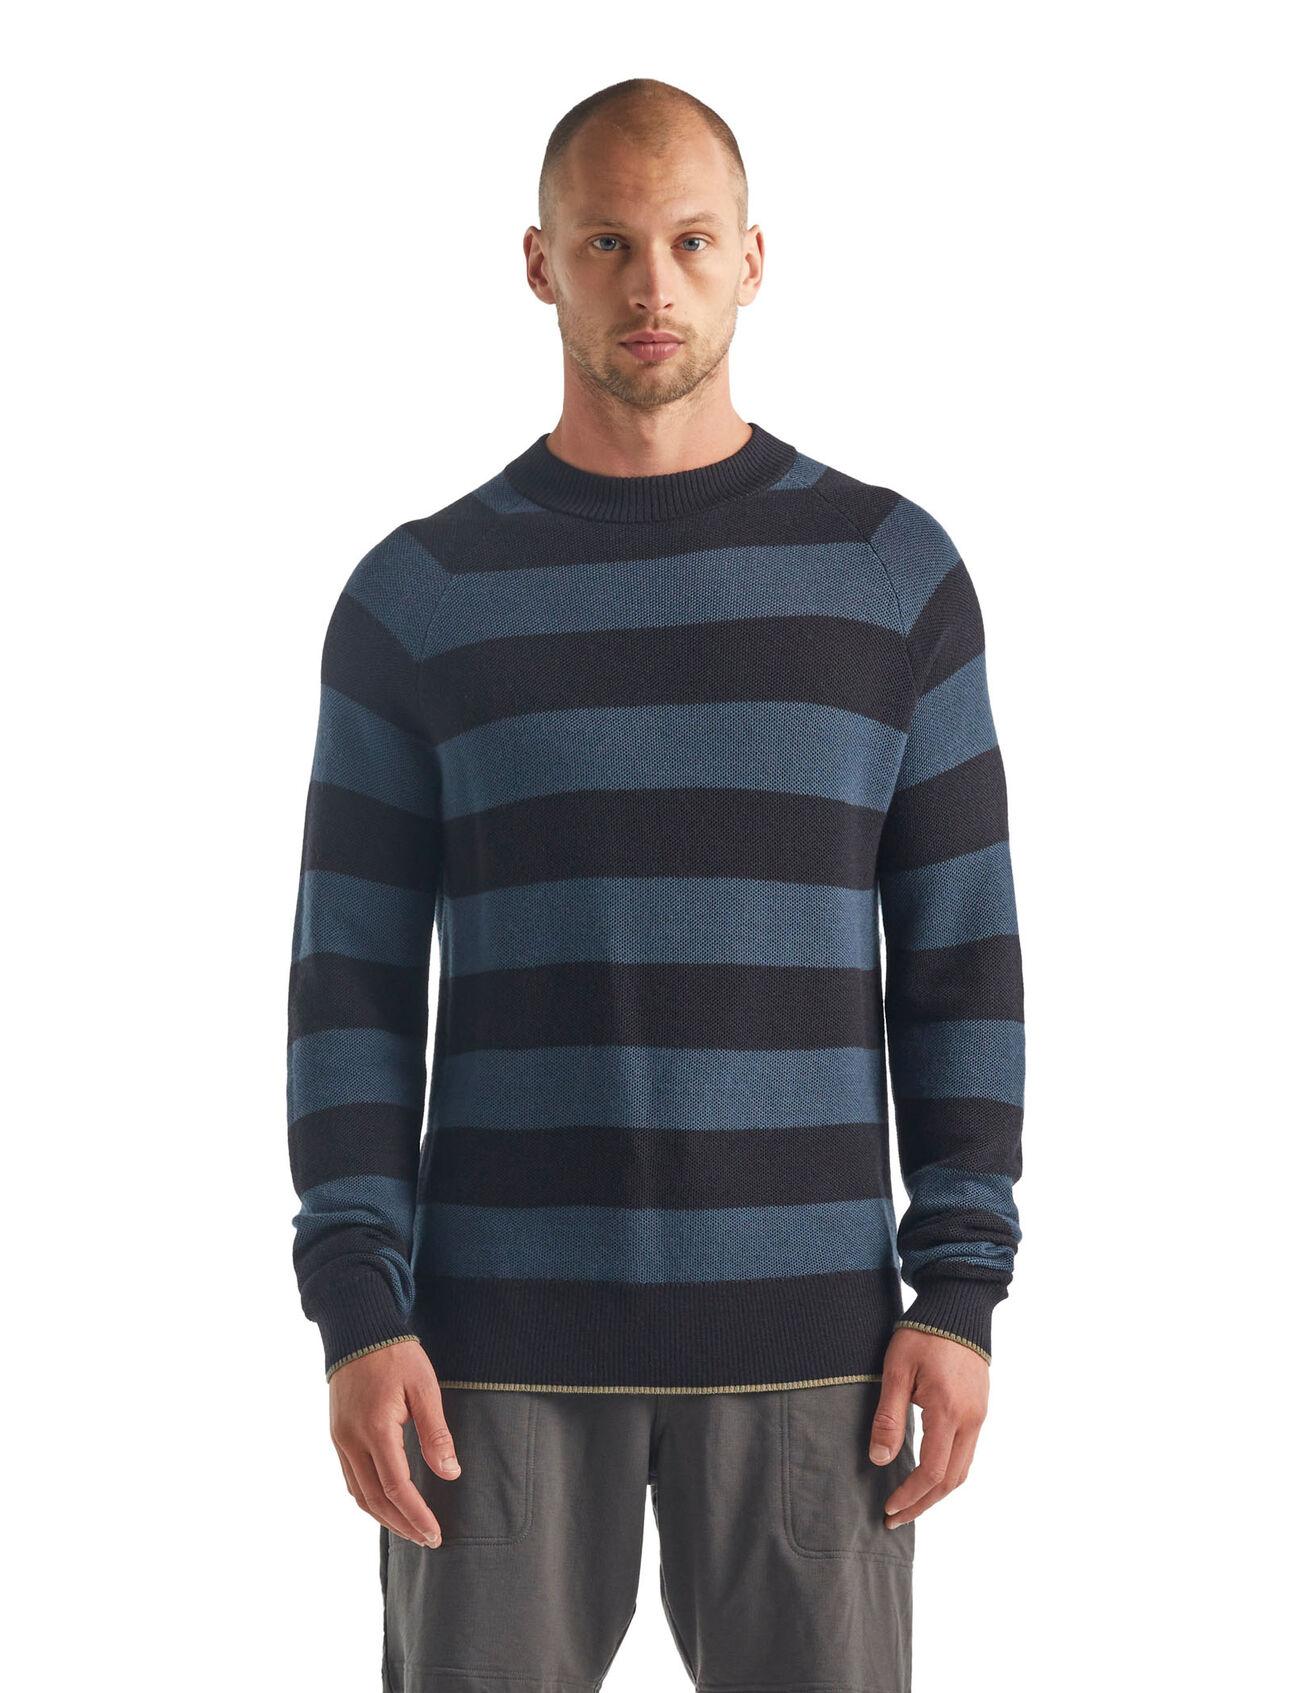 Cool-Lite™ Merino Utility Explore Crewe Sweater